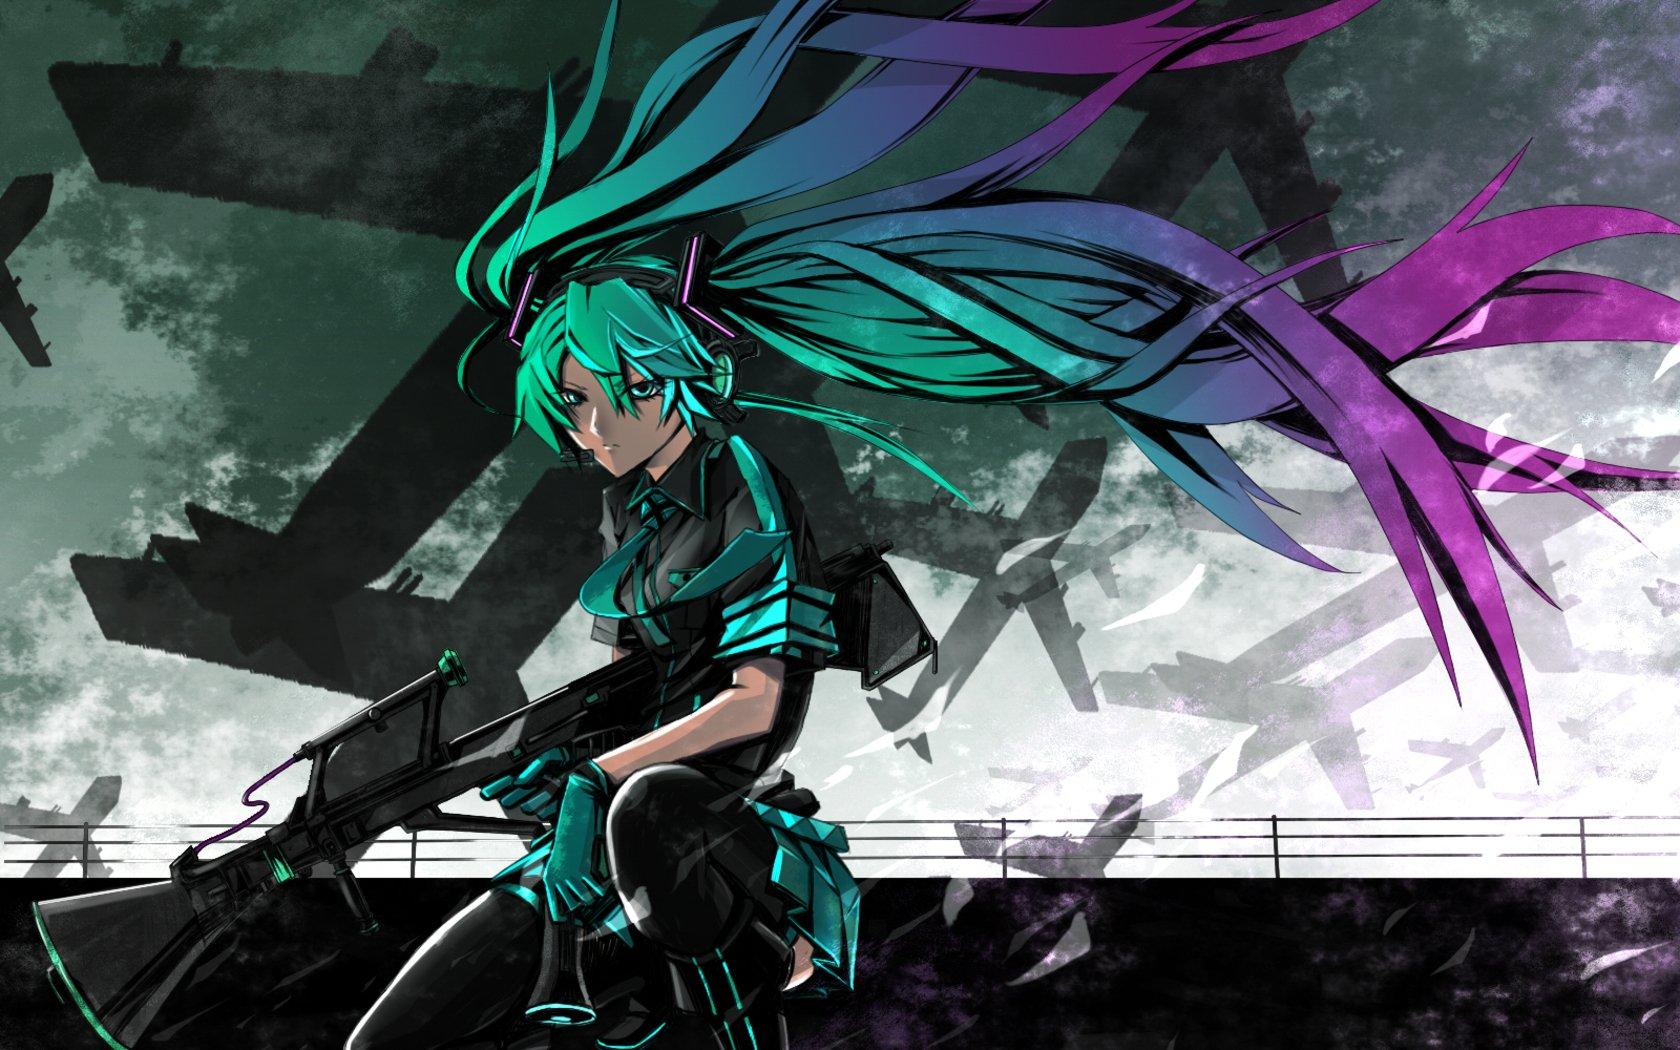 Anime - Vocaloid  Girl Anime Hatsune Miku Song Illustration Love is War  (Vocaloid) Wallpaper